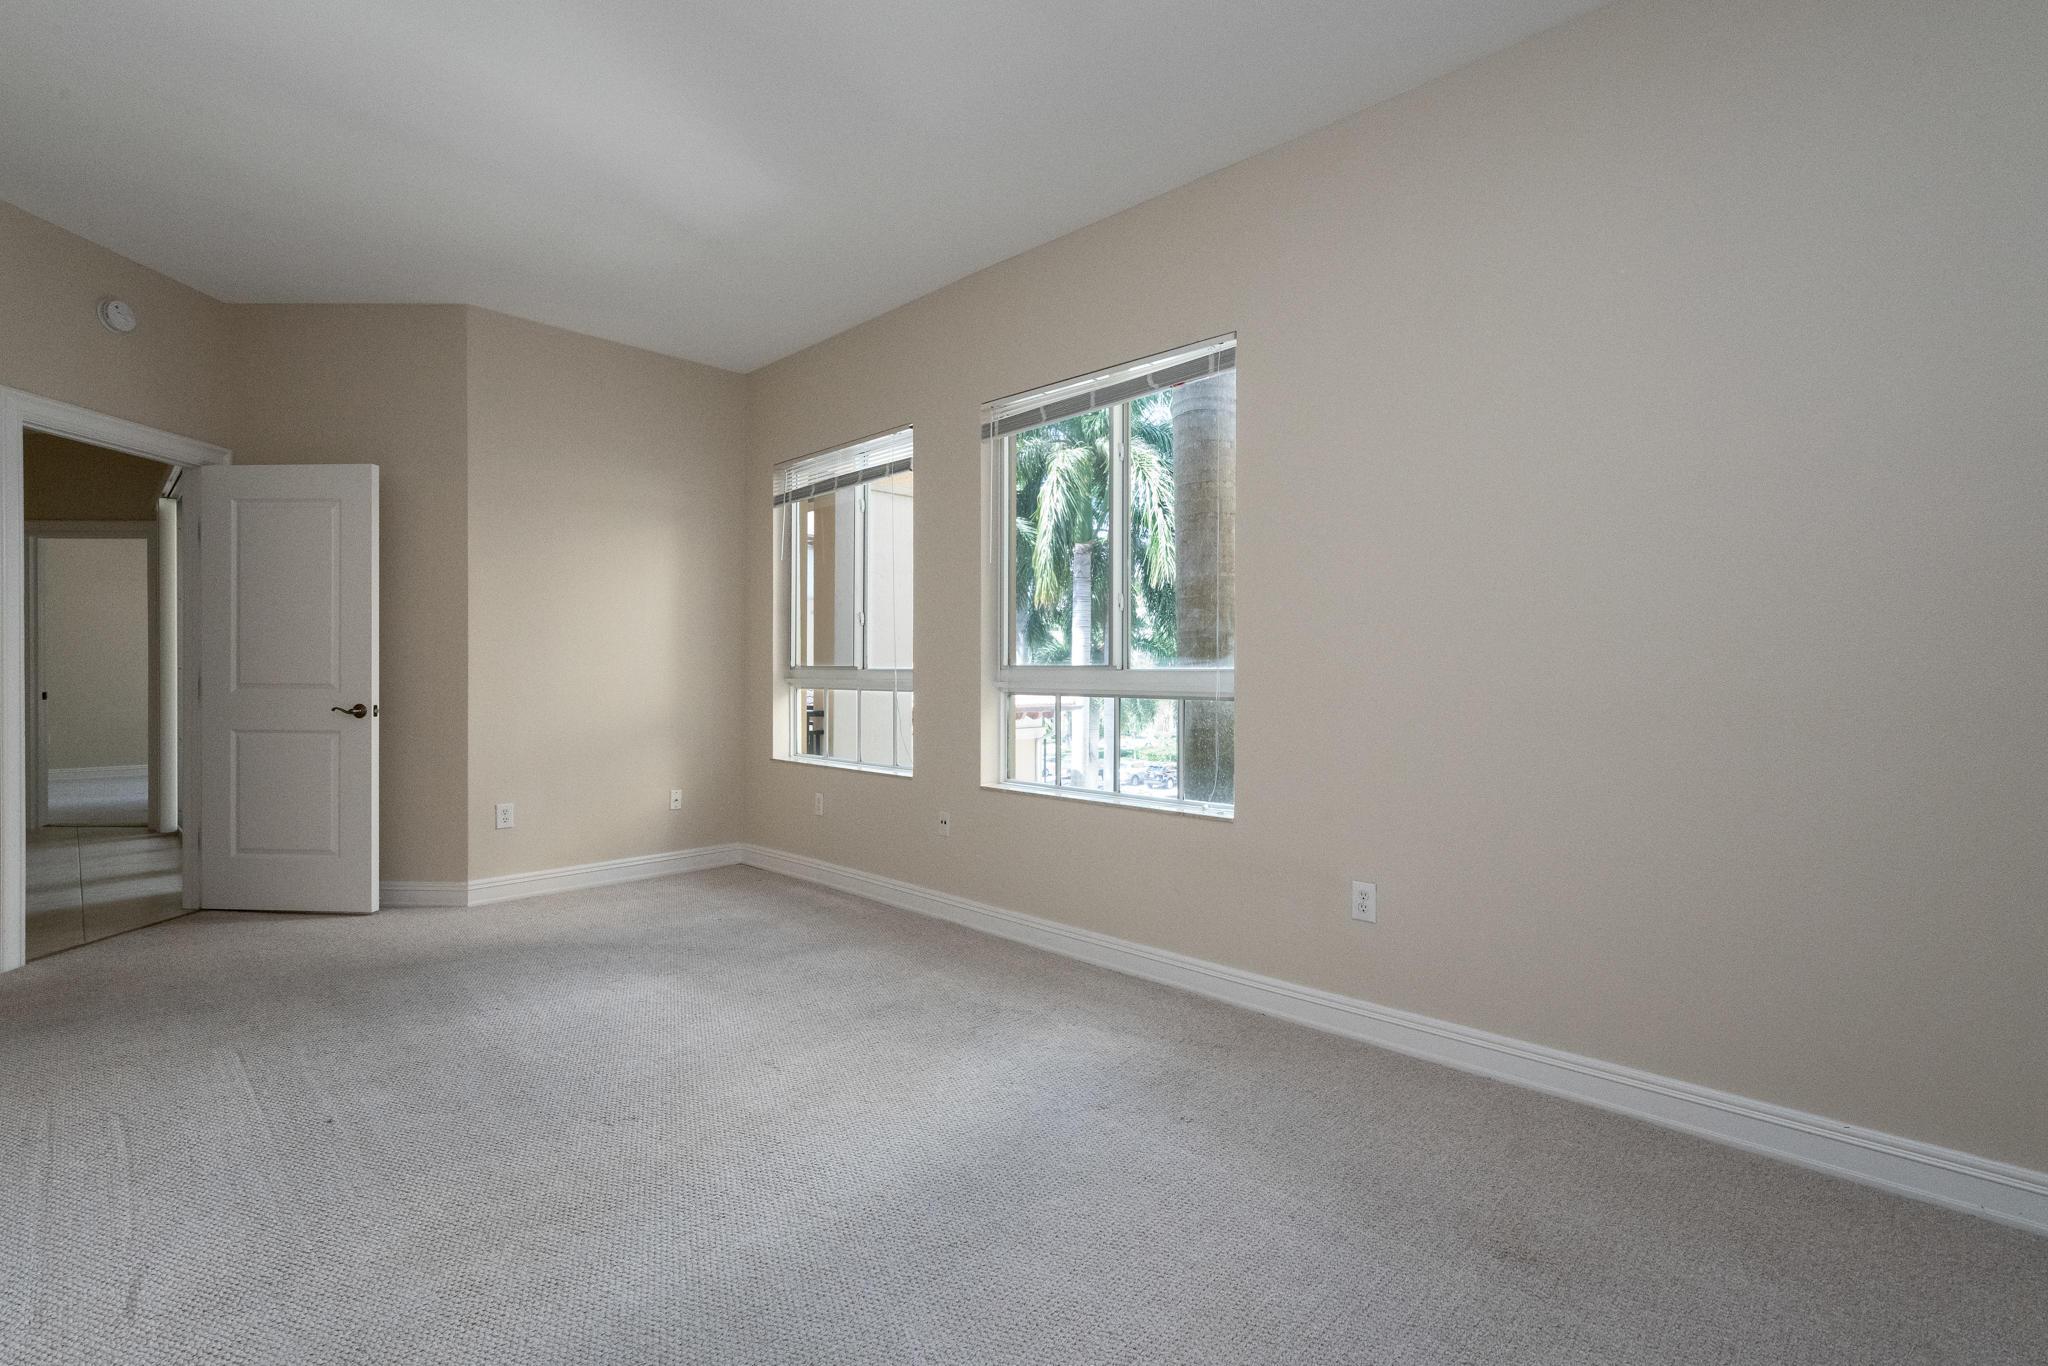 Image 13 For 16100 Emerald Estates Drive 390